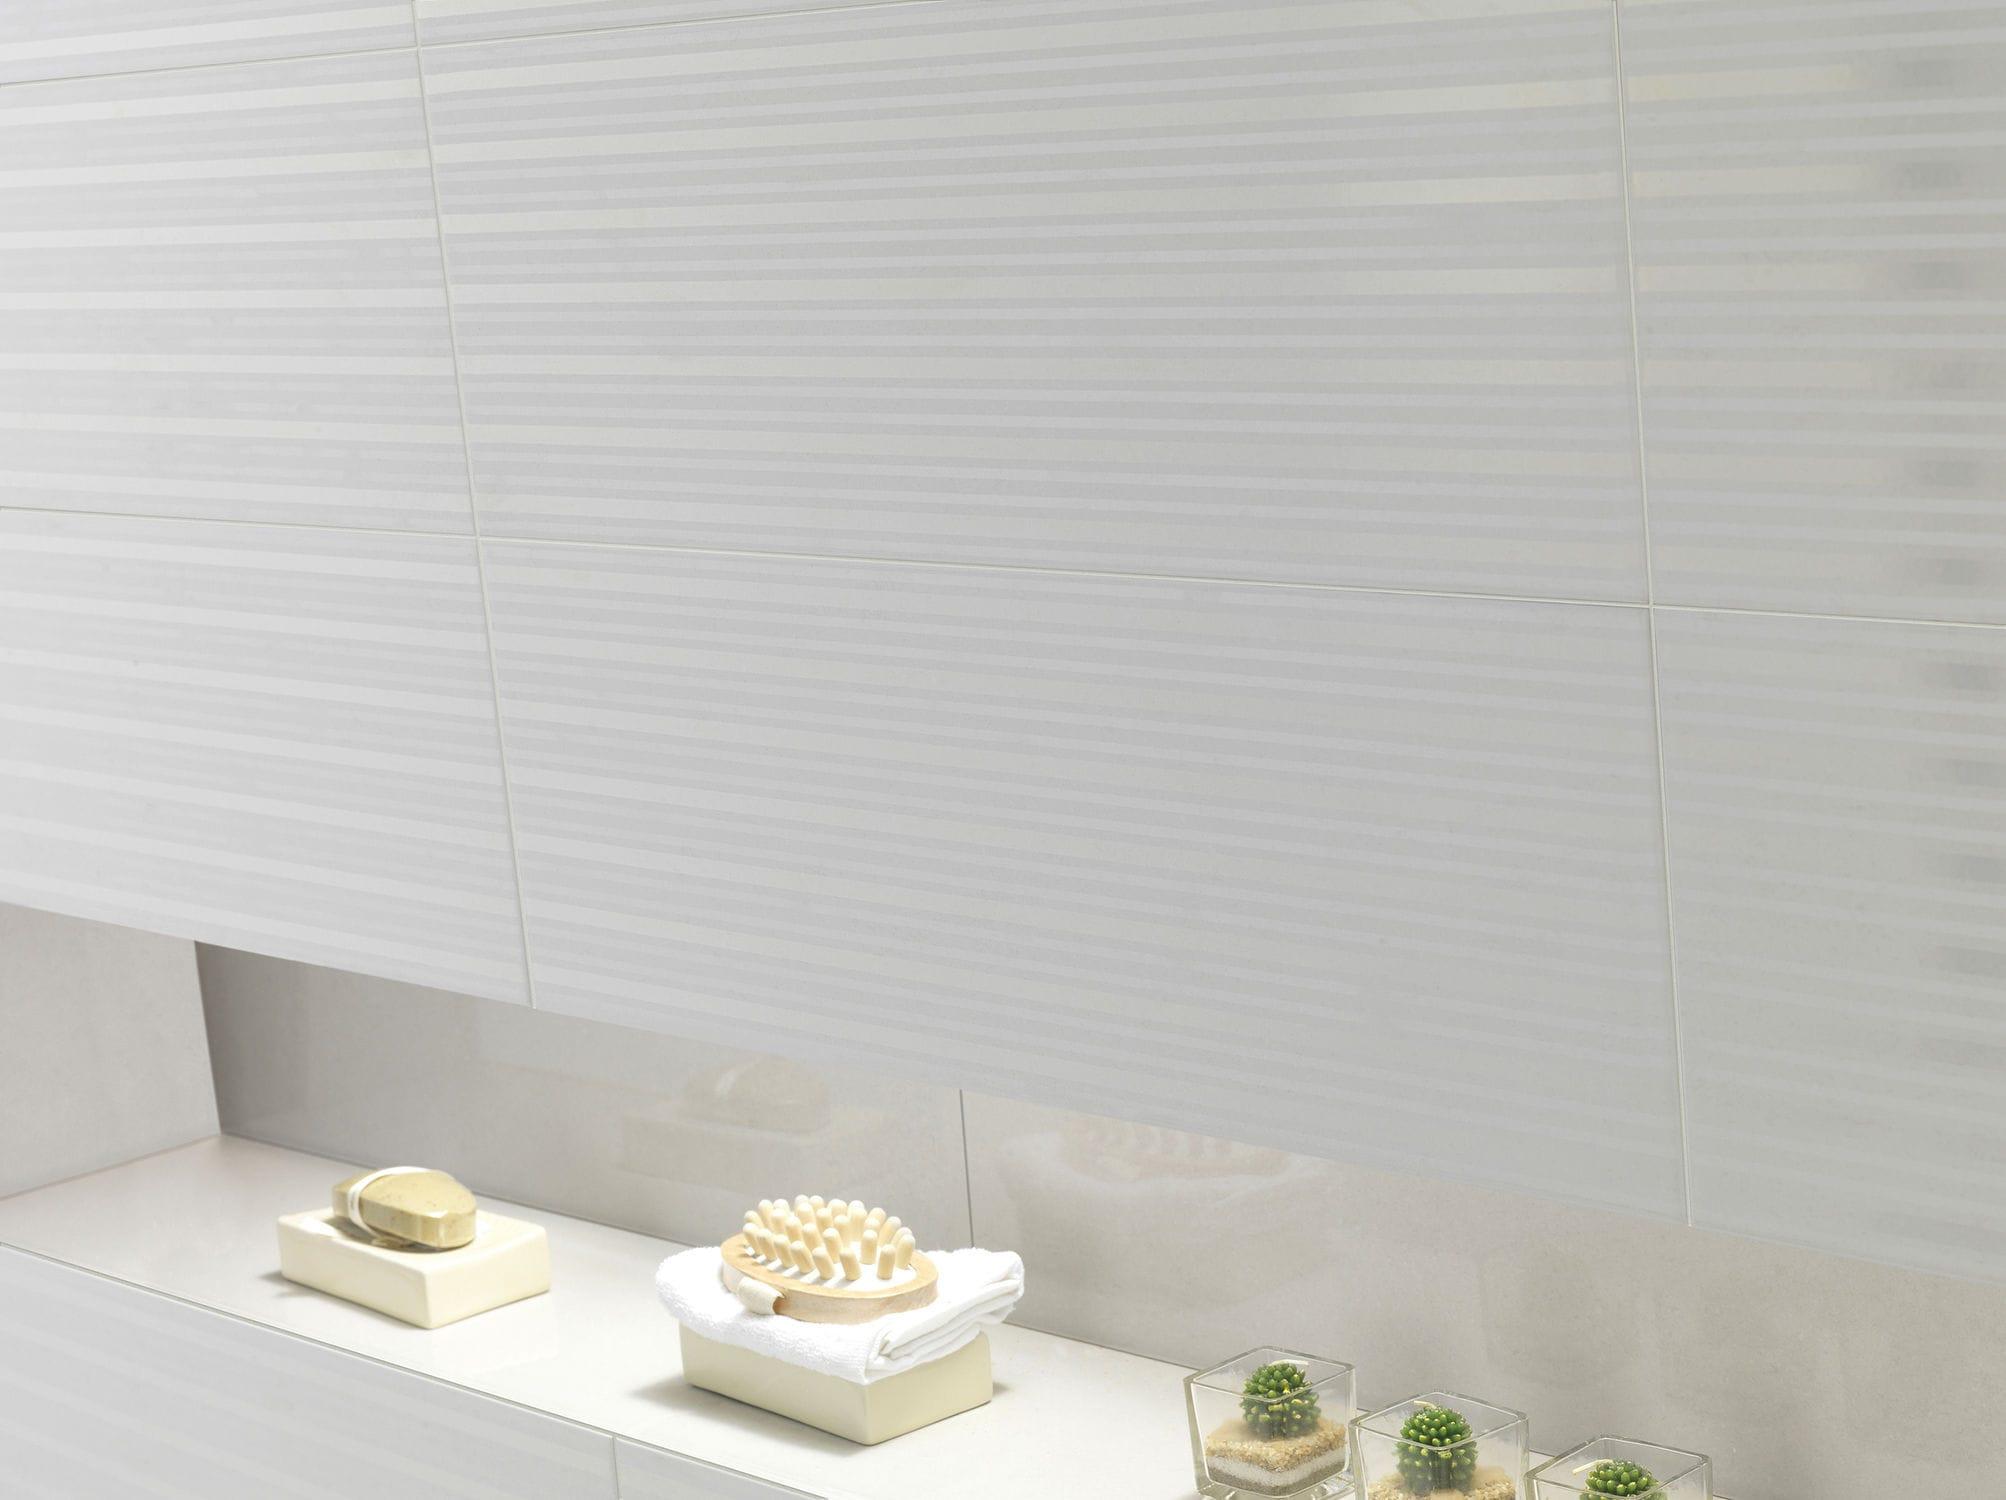 Bathroom tile wall ceramic plain hard rock domino bathroom tile wall ceramic plain hard rock domino dailygadgetfo Images